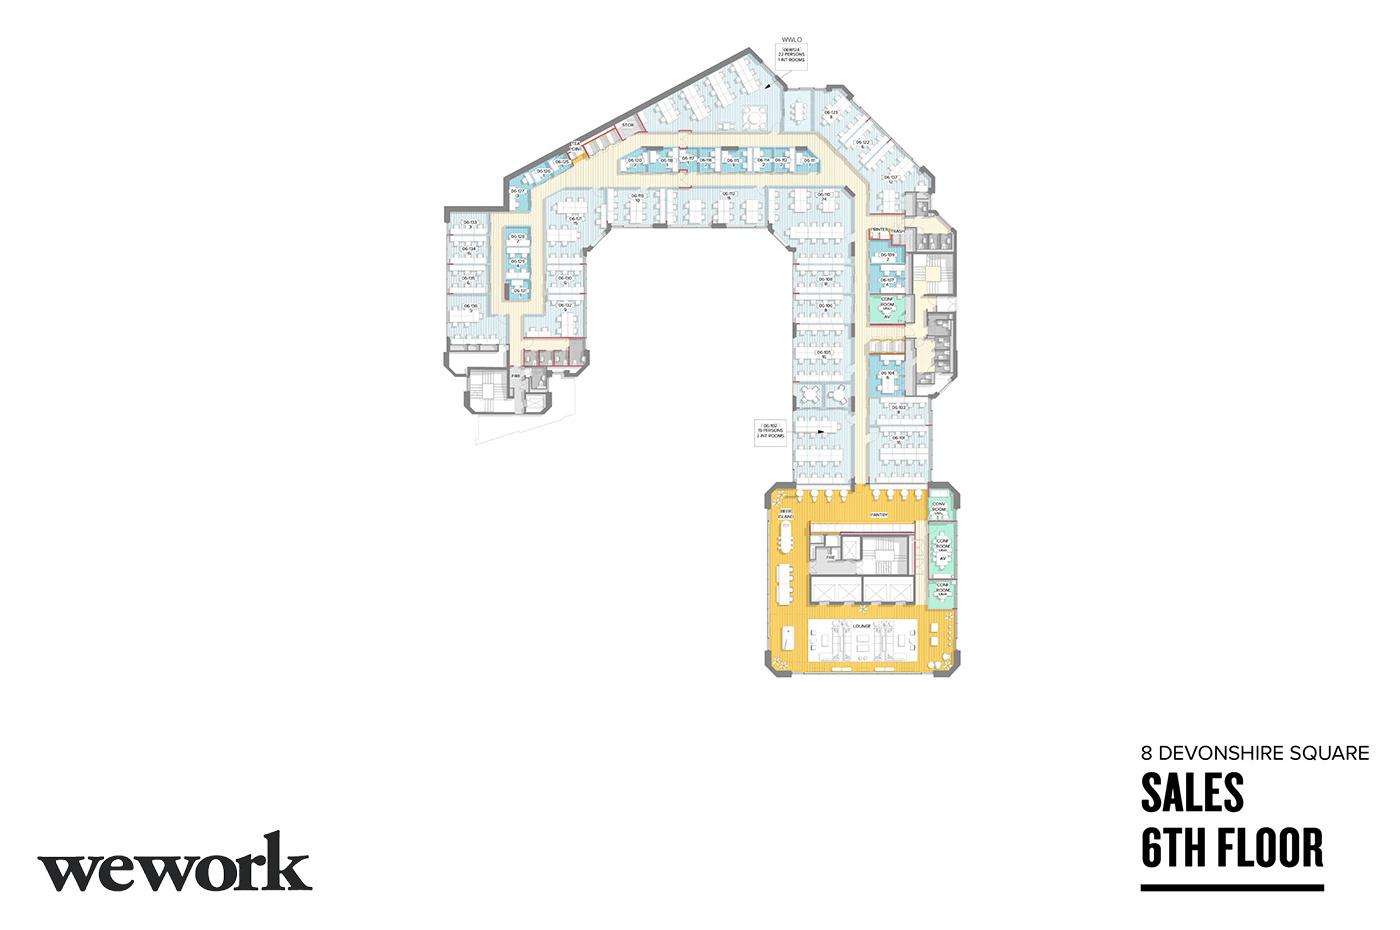 floorplans-7 copy.jpg